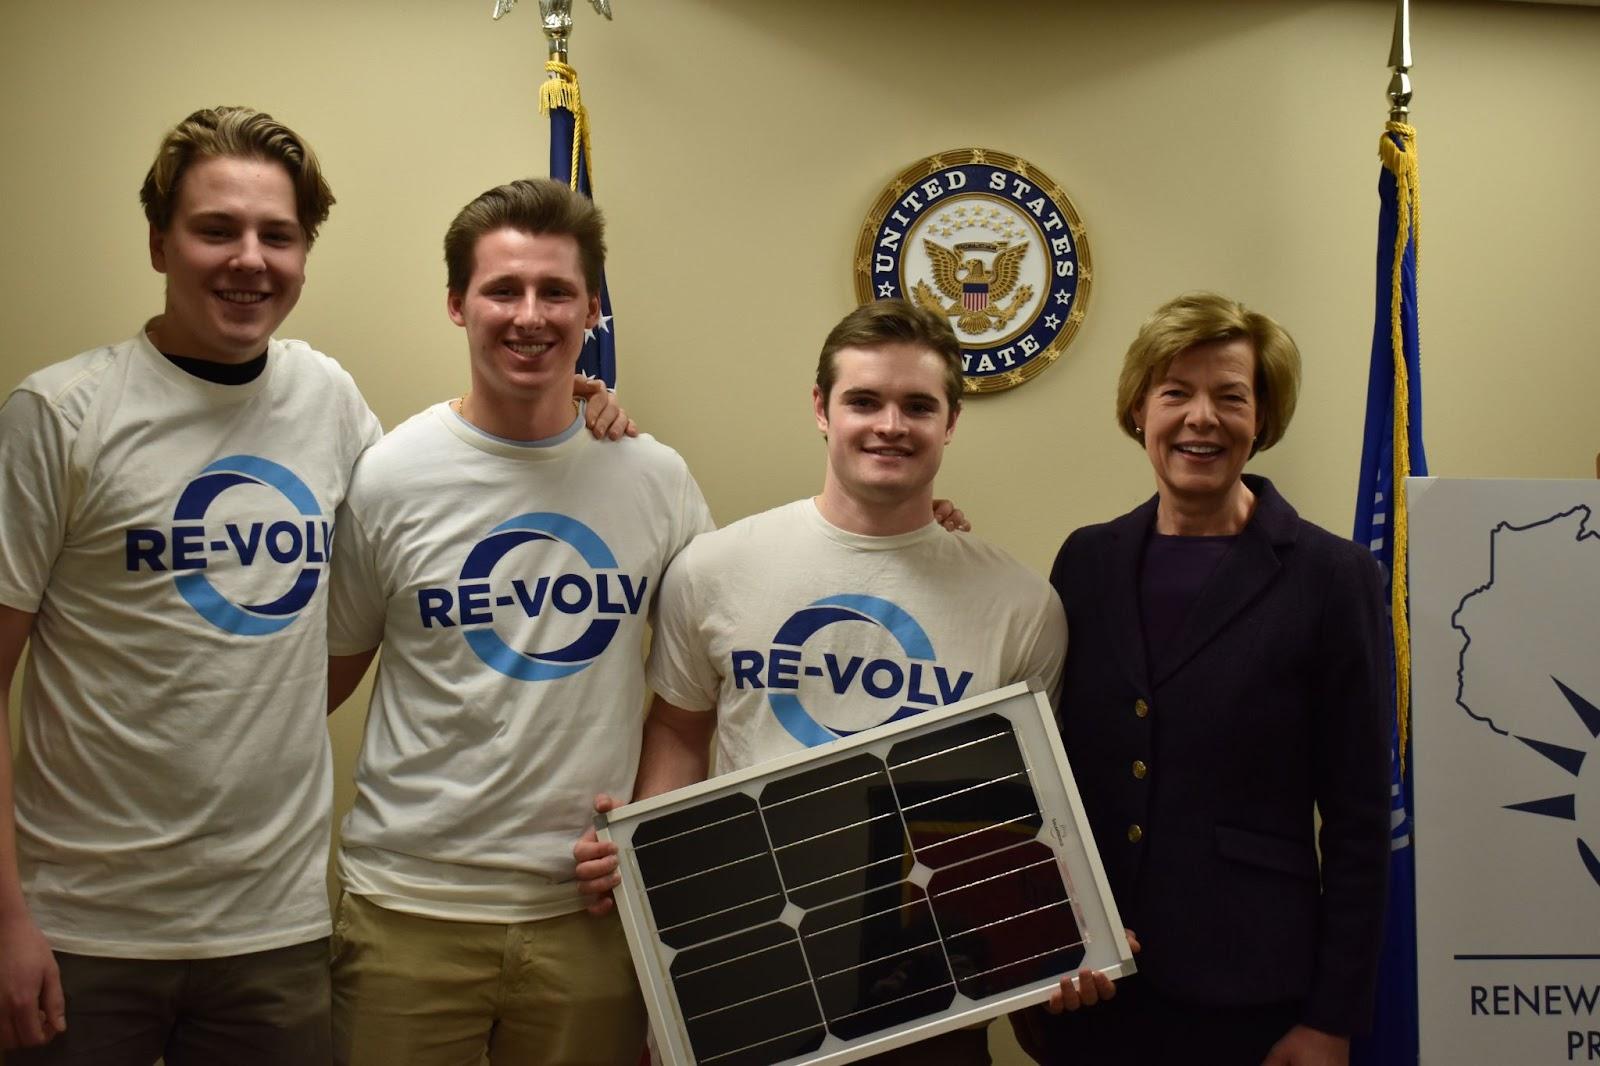 UW Madison RE-volv Solar Ambassador Team